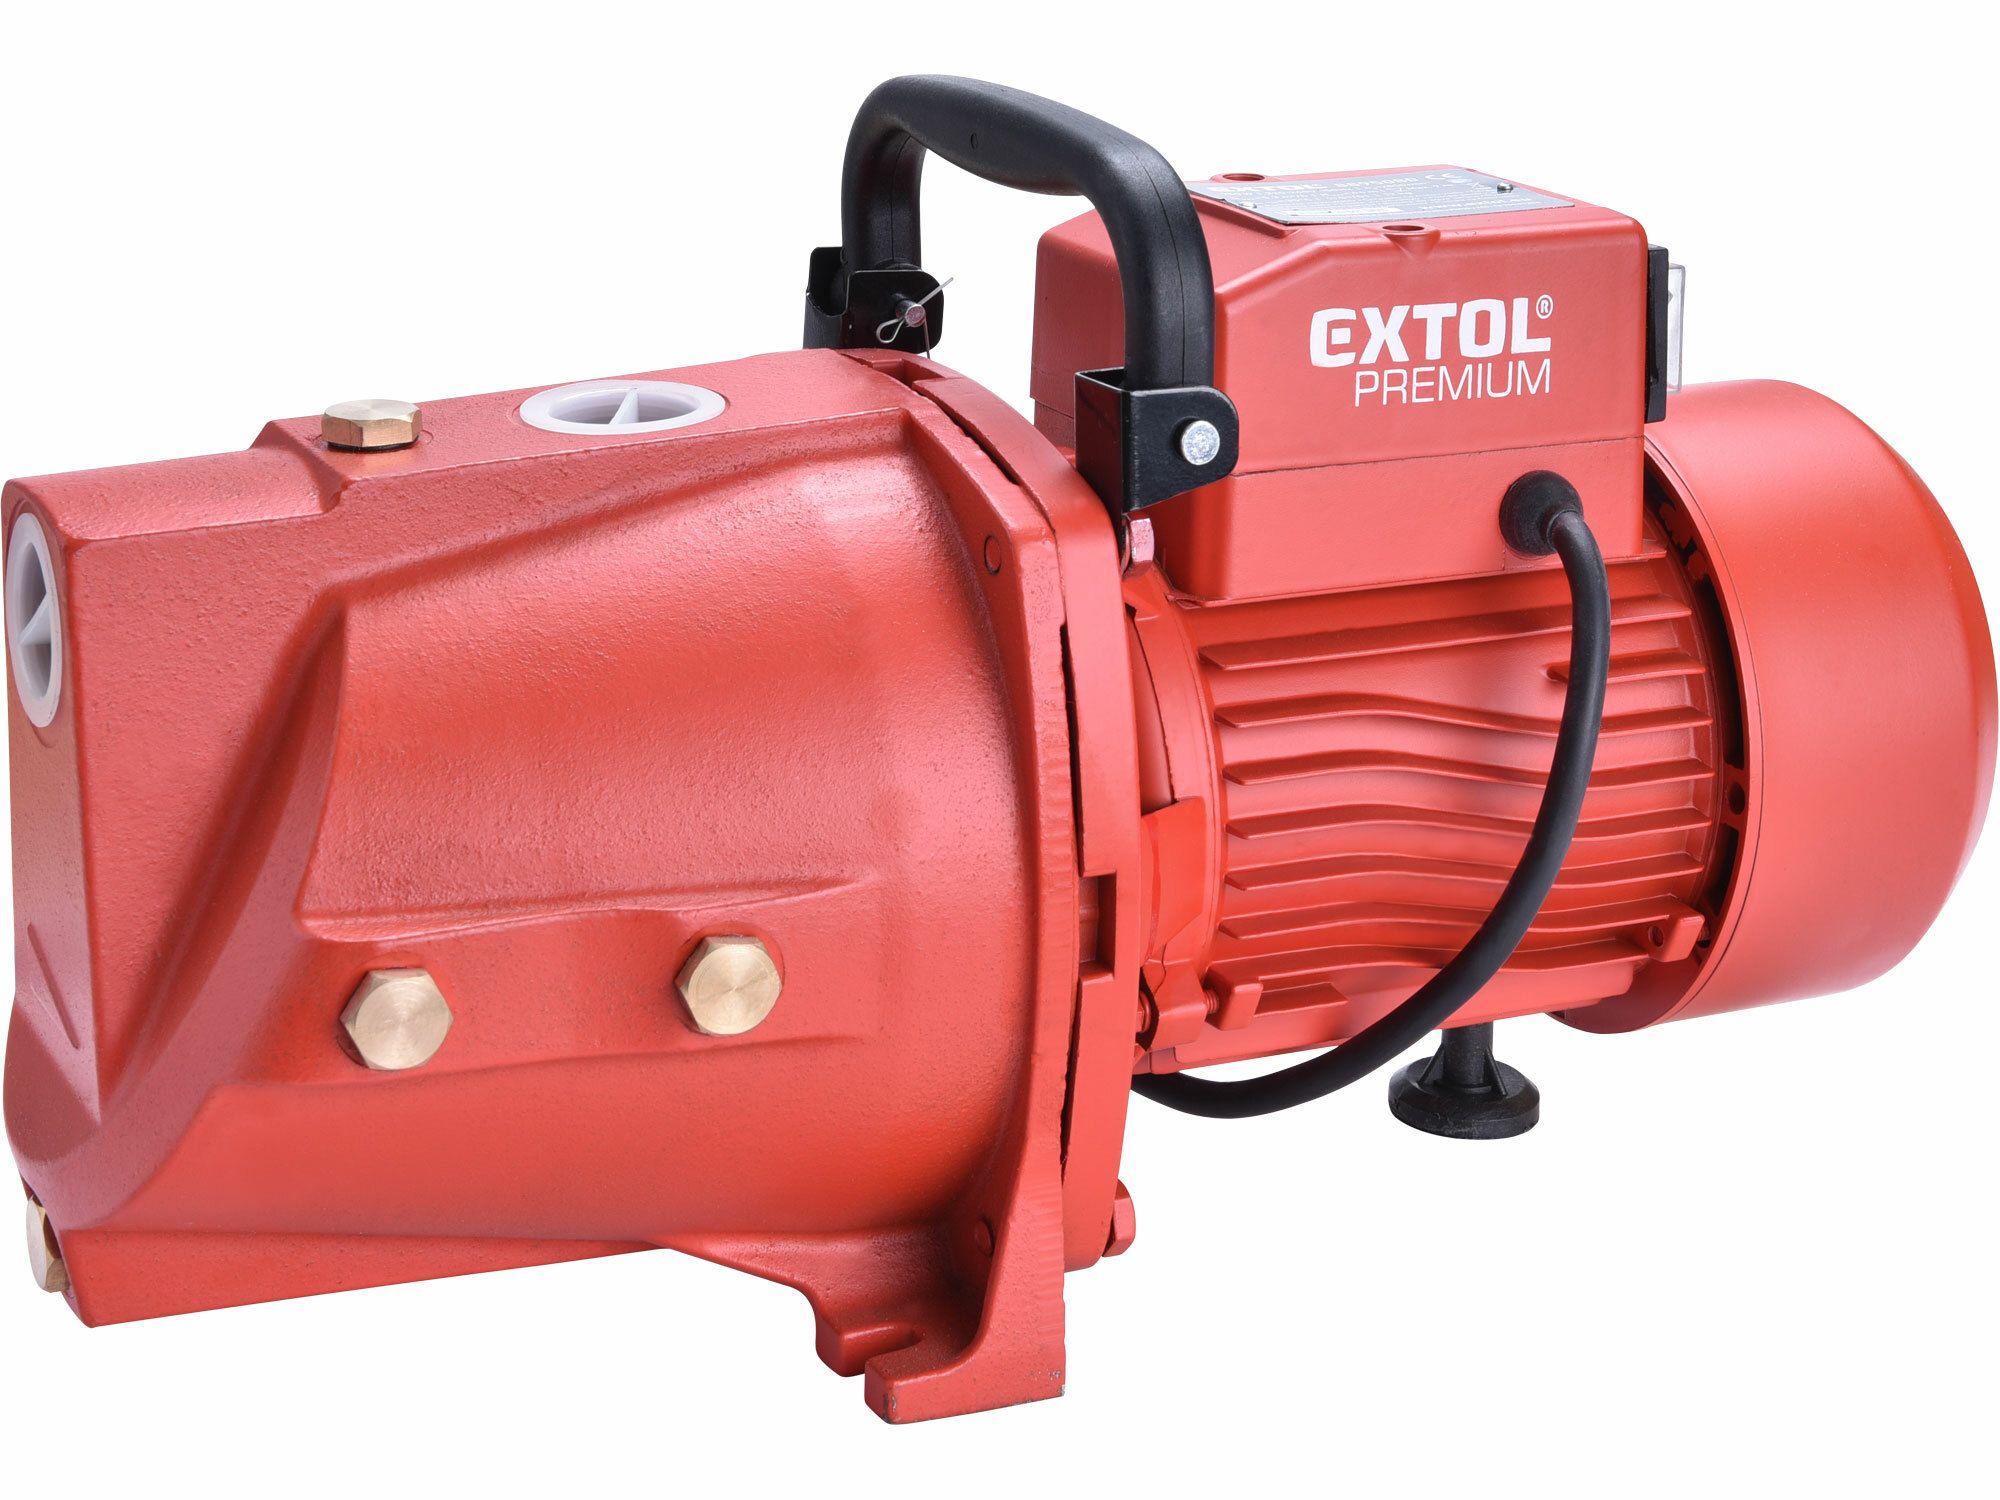 Čerpadlo proudové, 750W, 5270l/hod, EXTOL PREMIUM, 8895080